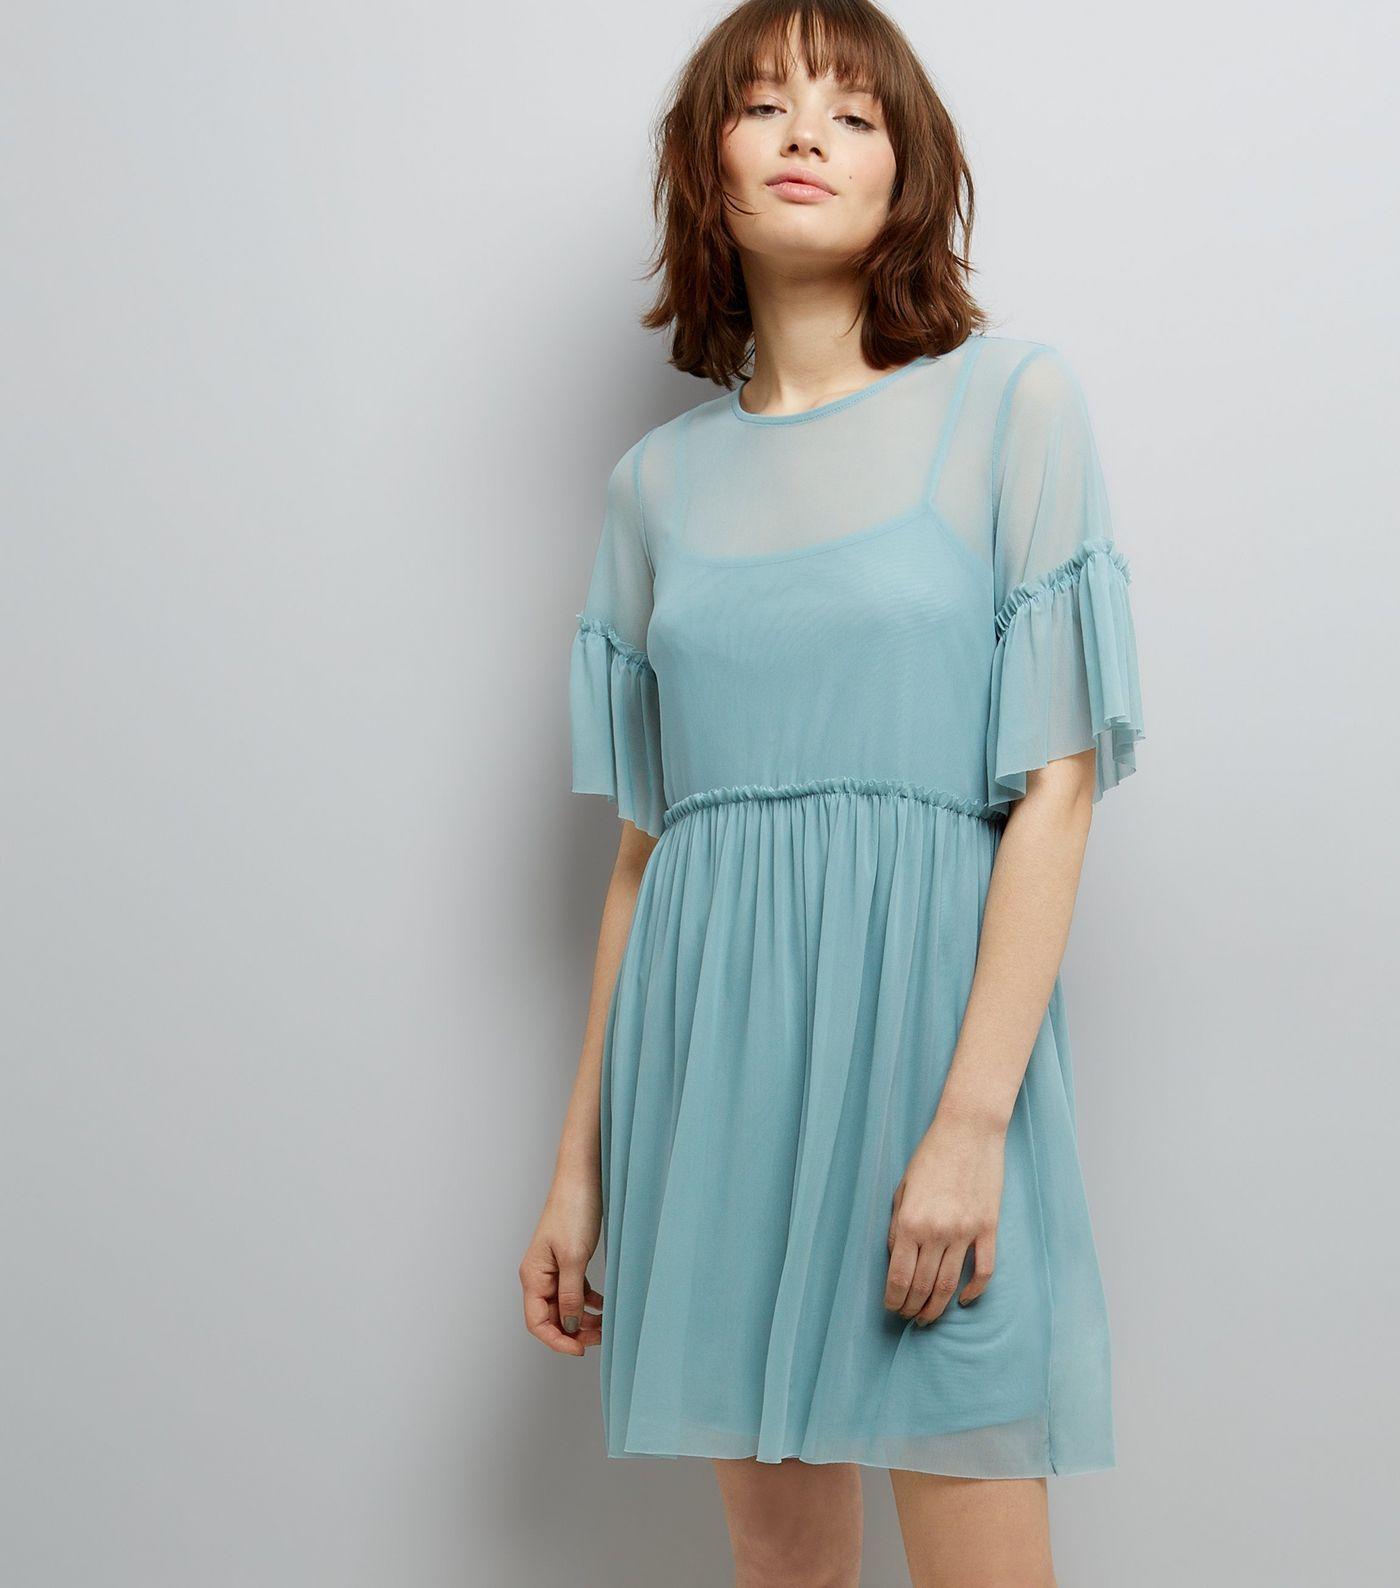 Pale Blue Mesh Skater Dress | New Look | fashion | Pinterest | Shopping